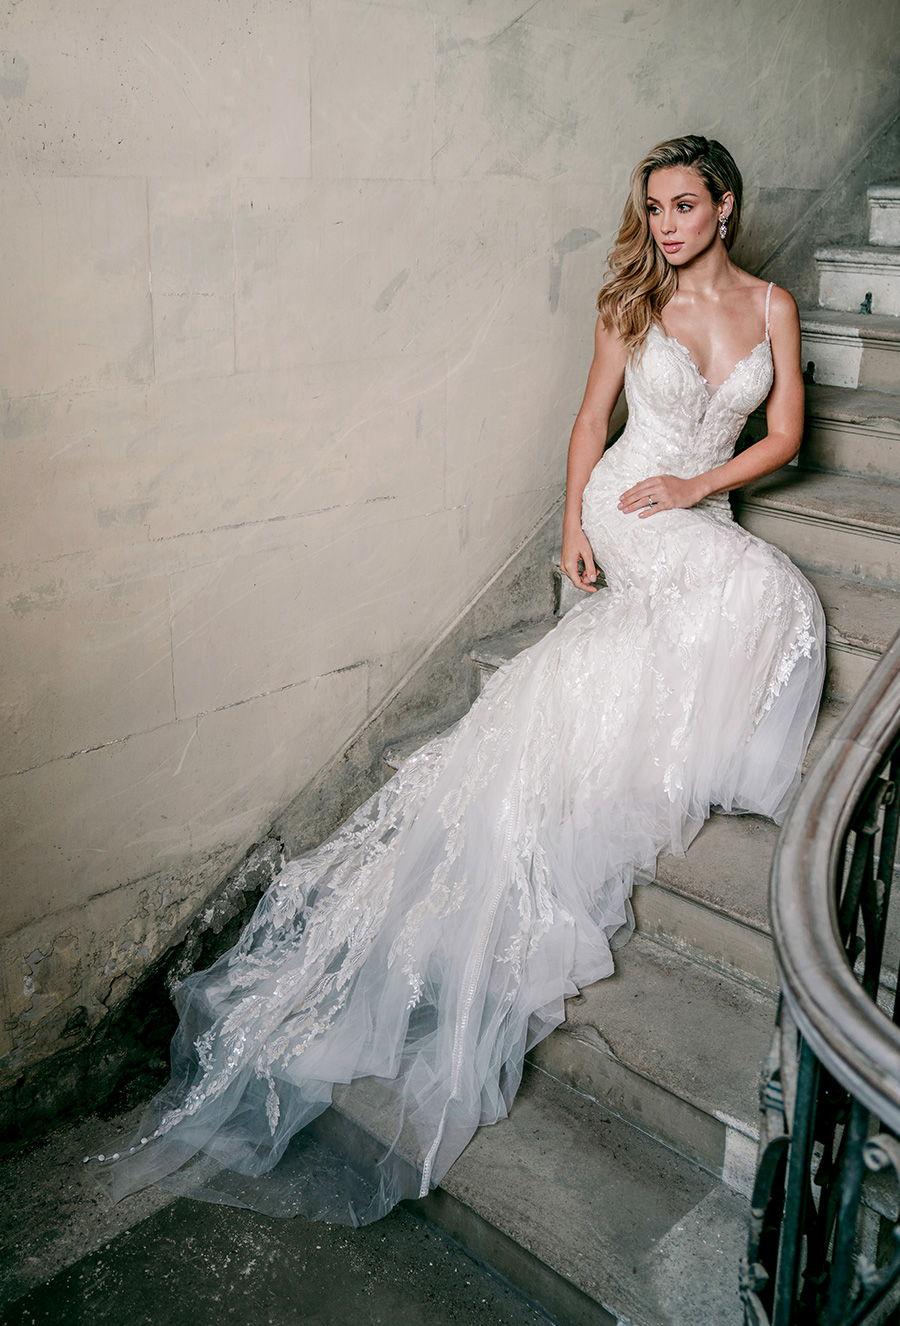 madison james spring 2020 bridal spaghetti strap diamond neck full embellishment elegant fit and flare wedding dress backless scoop back medium train (mj619) mv